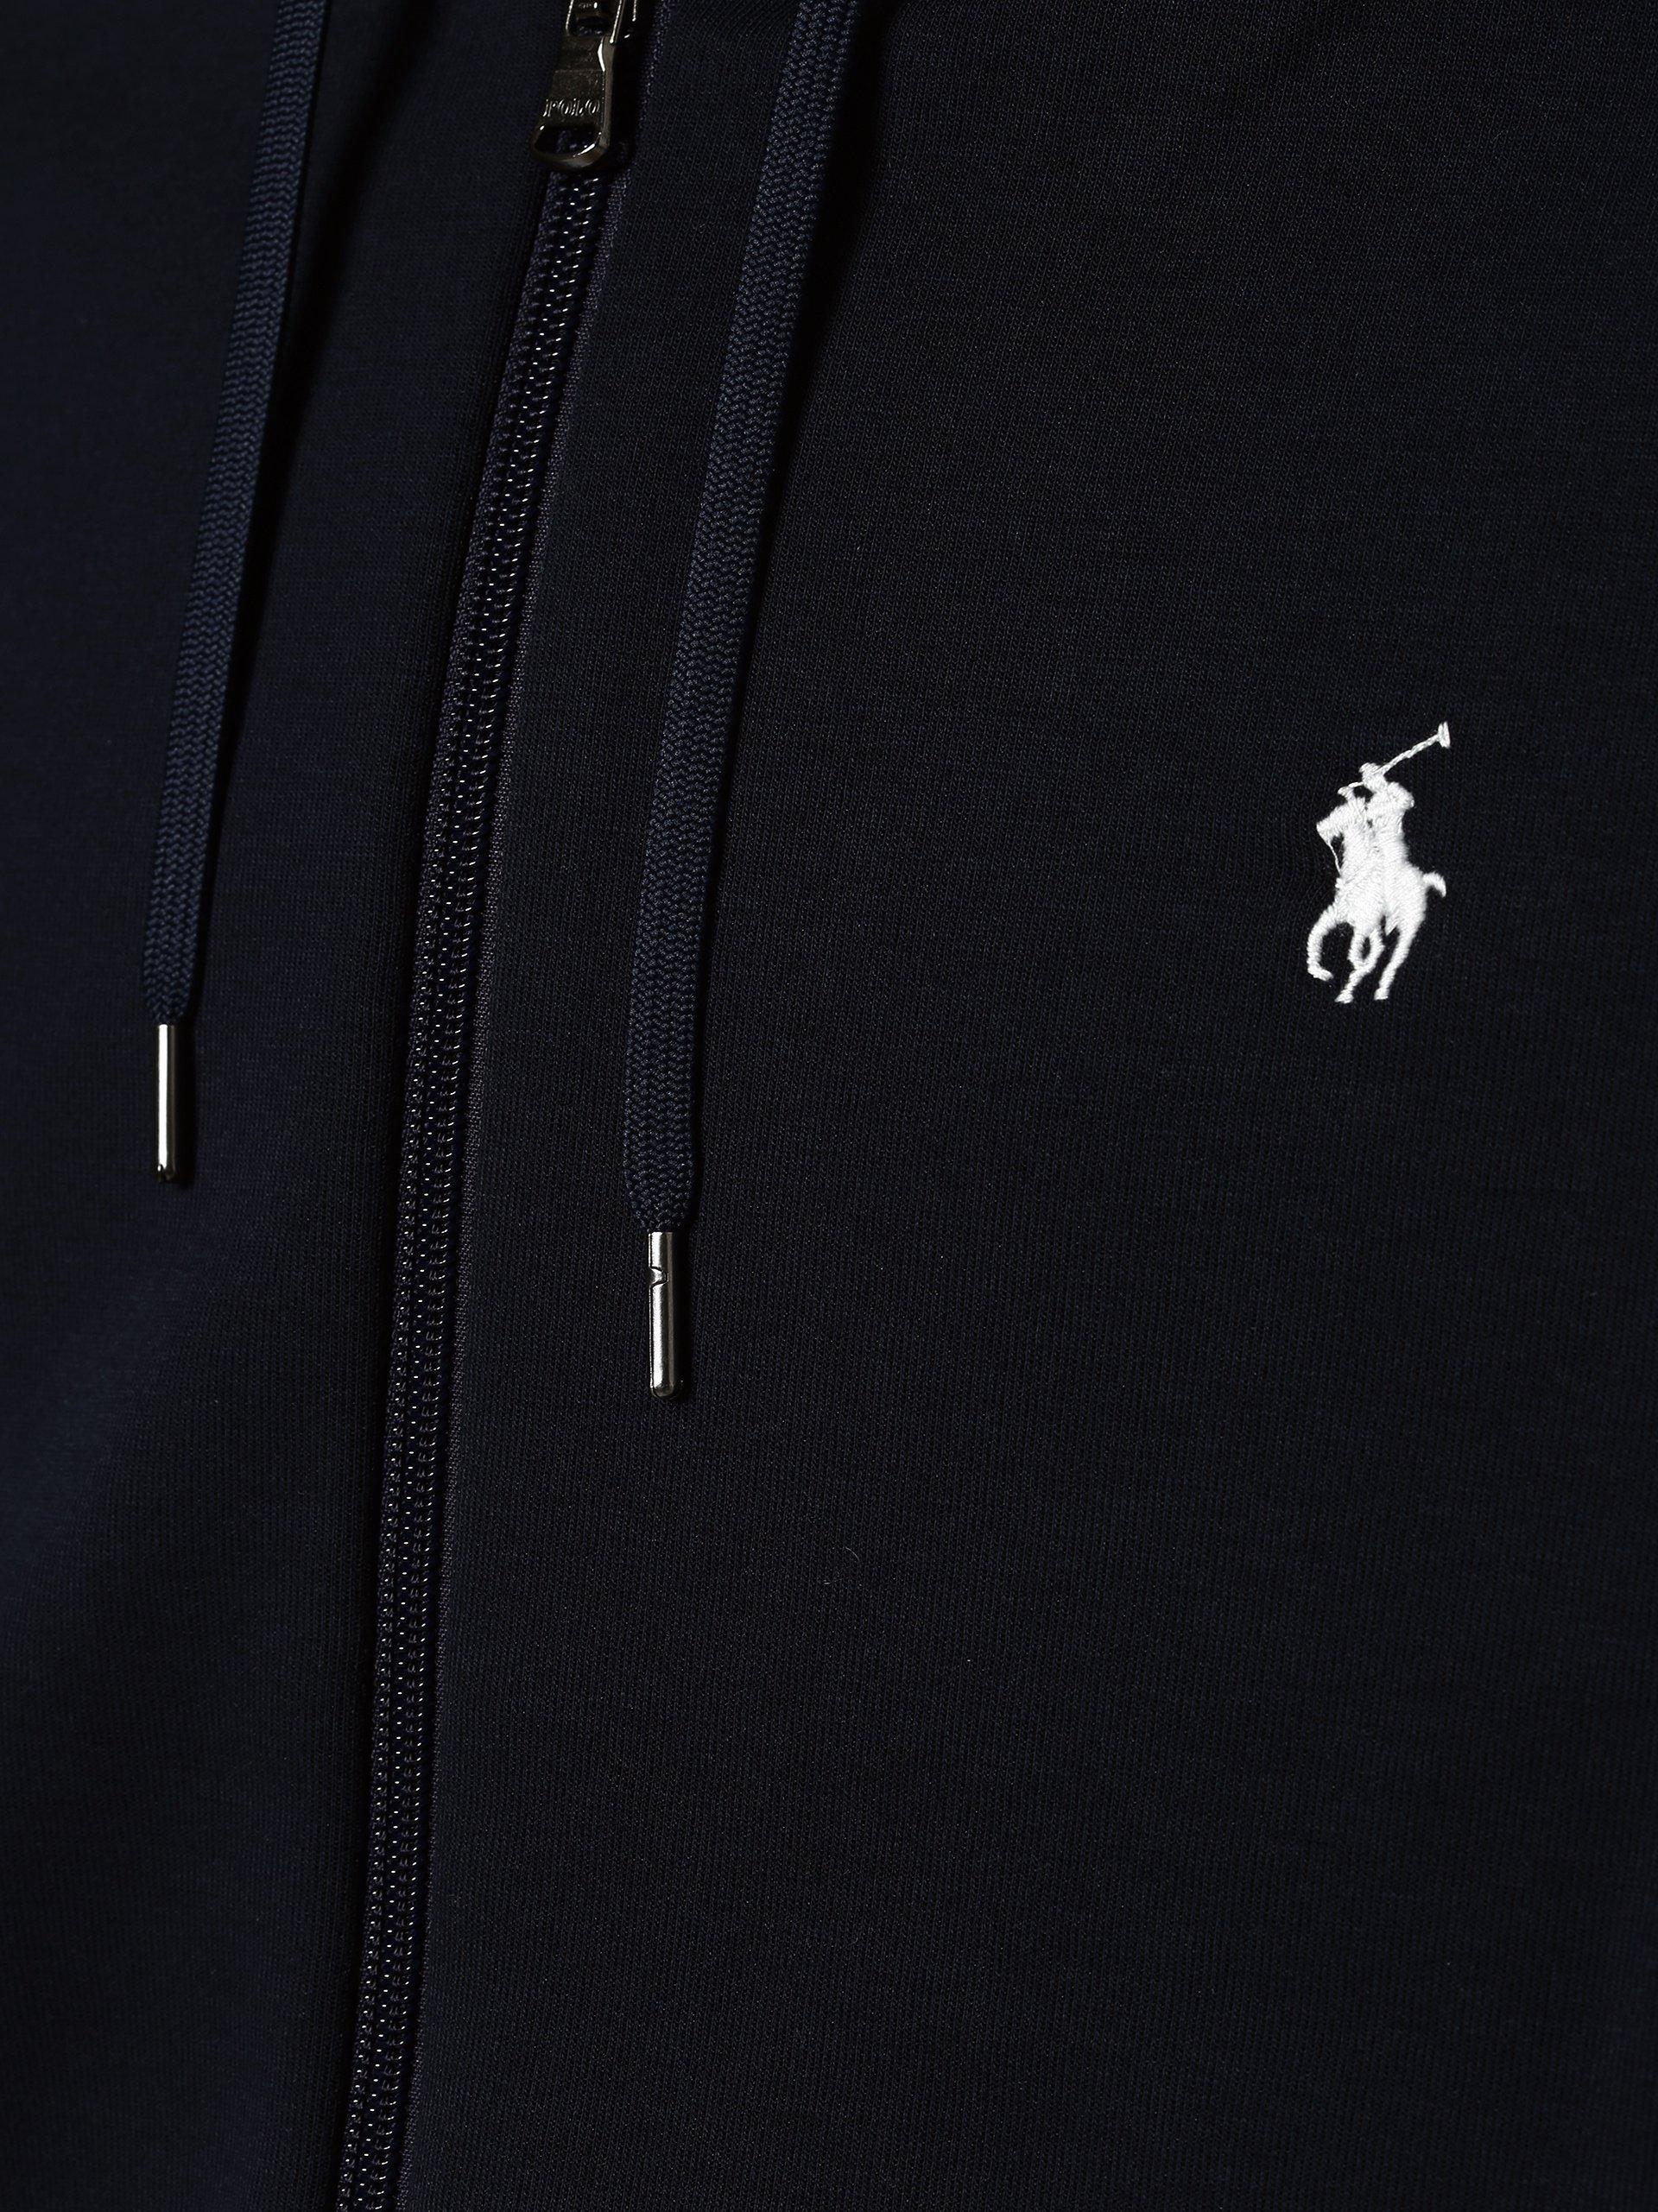 Polo Ralph Lauren Męska bluza rozpinana